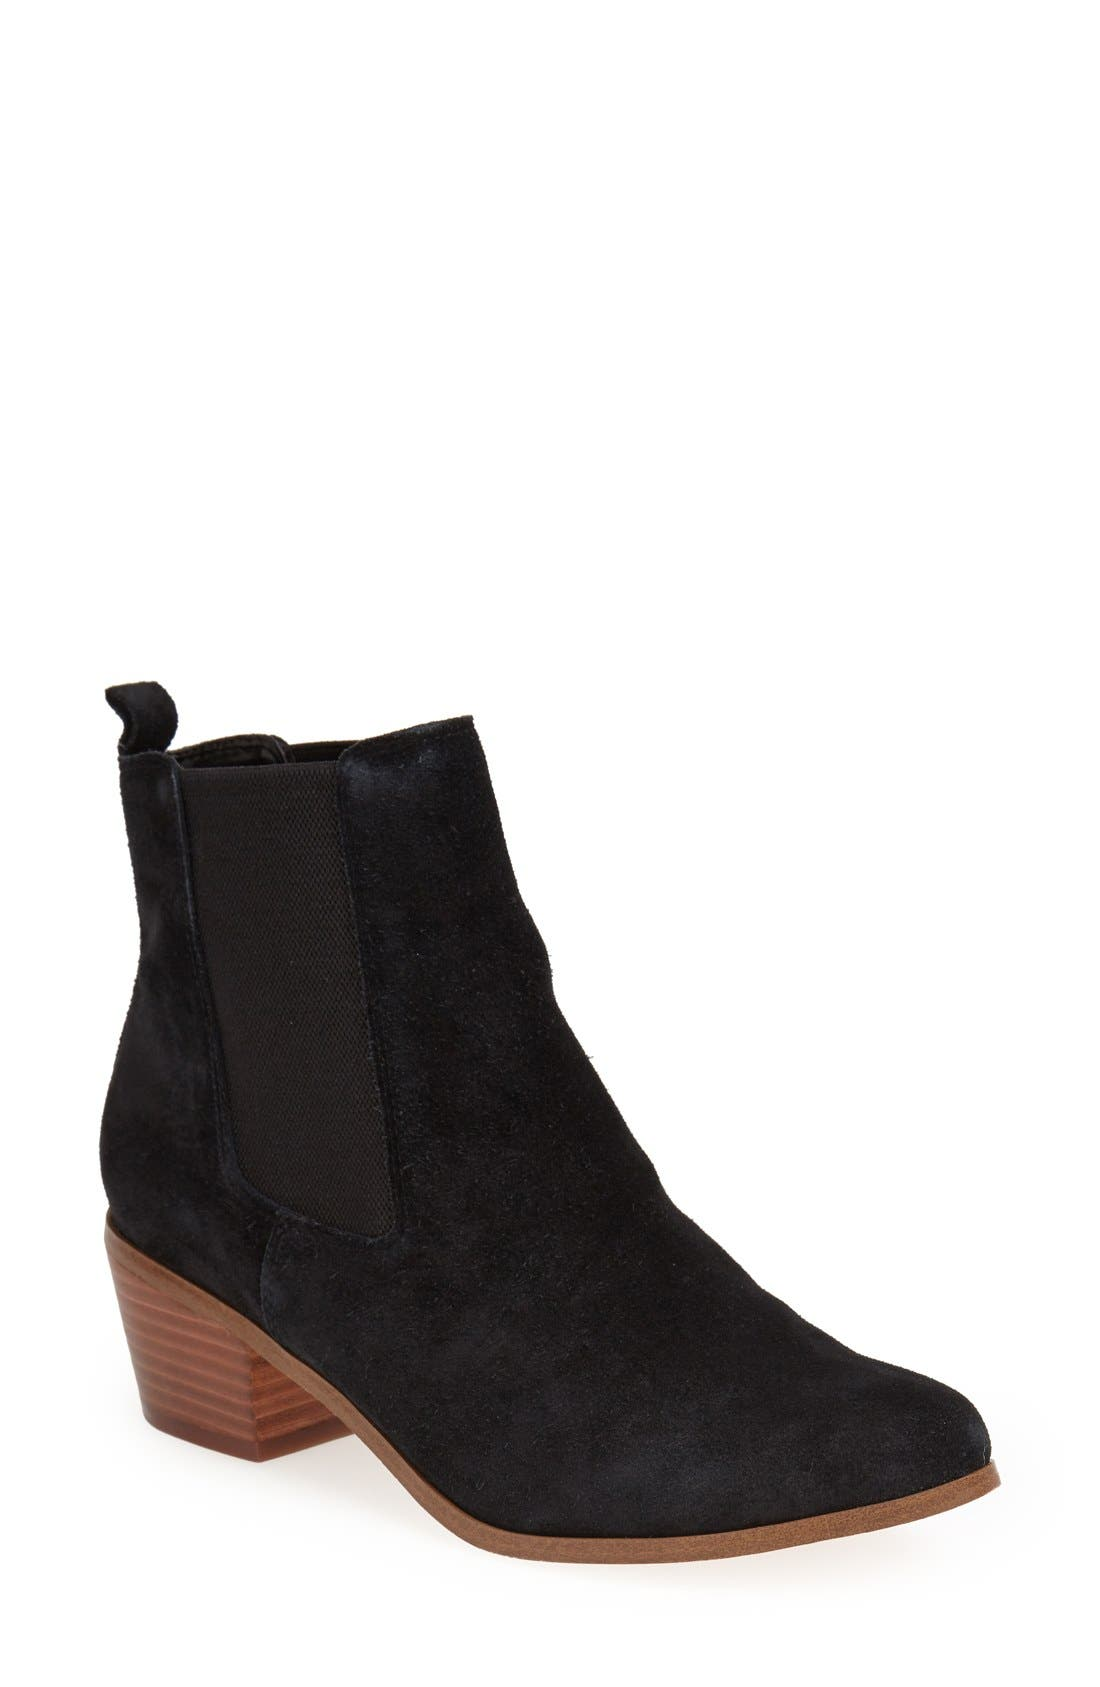 Main Image - Topshop 'Annex' Chelsea Ankle Boot (Women)